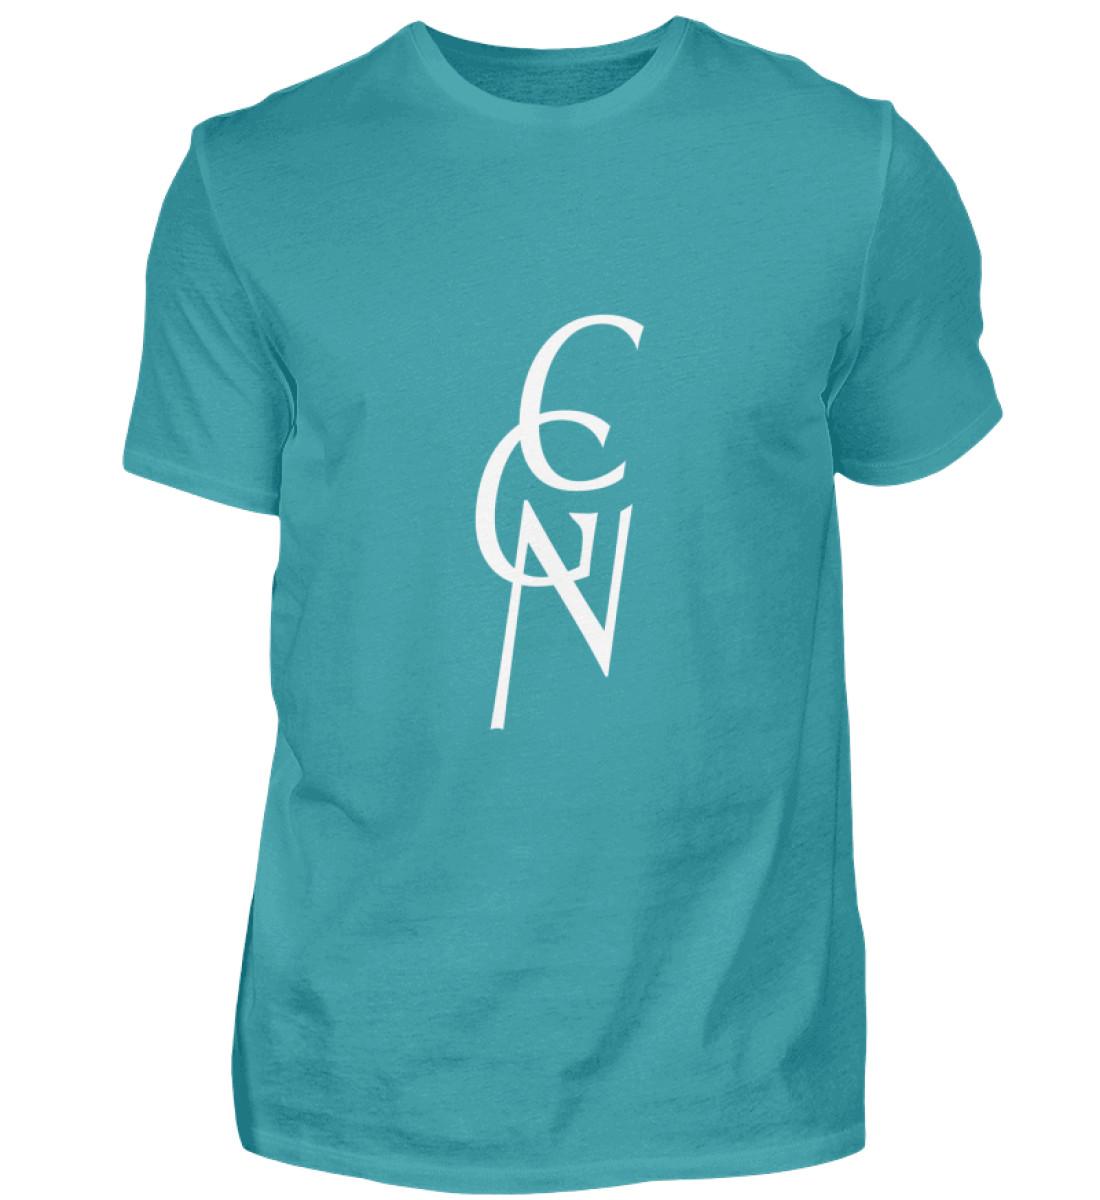 CGN - T-Shirt Herren - Herren Shirt-1242